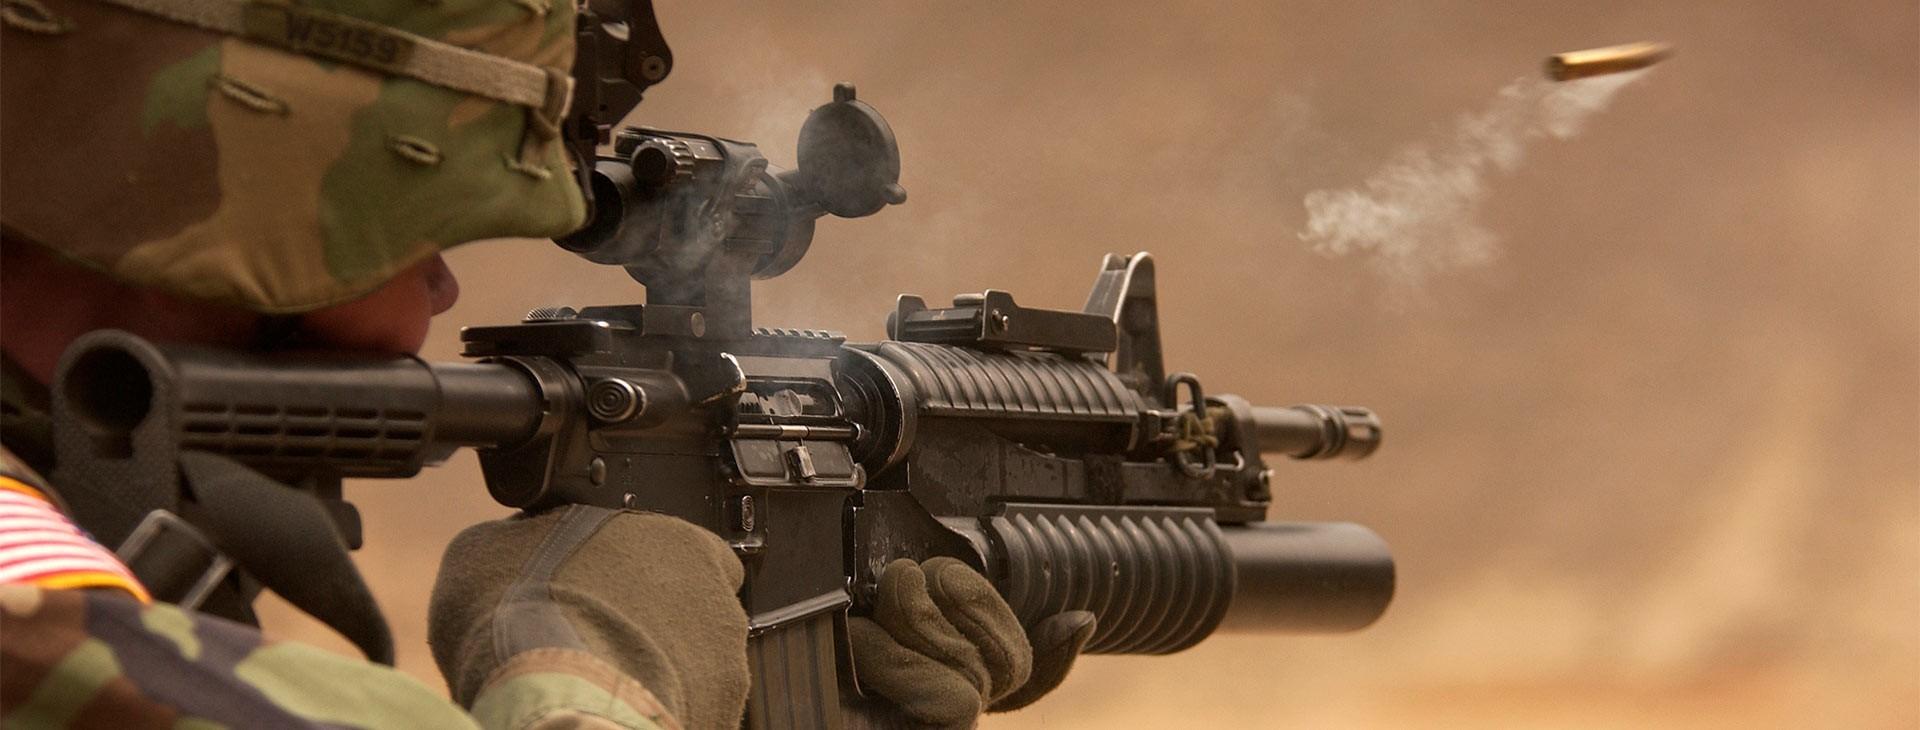 Blancos de tiro metalicos - Madwolf Targets